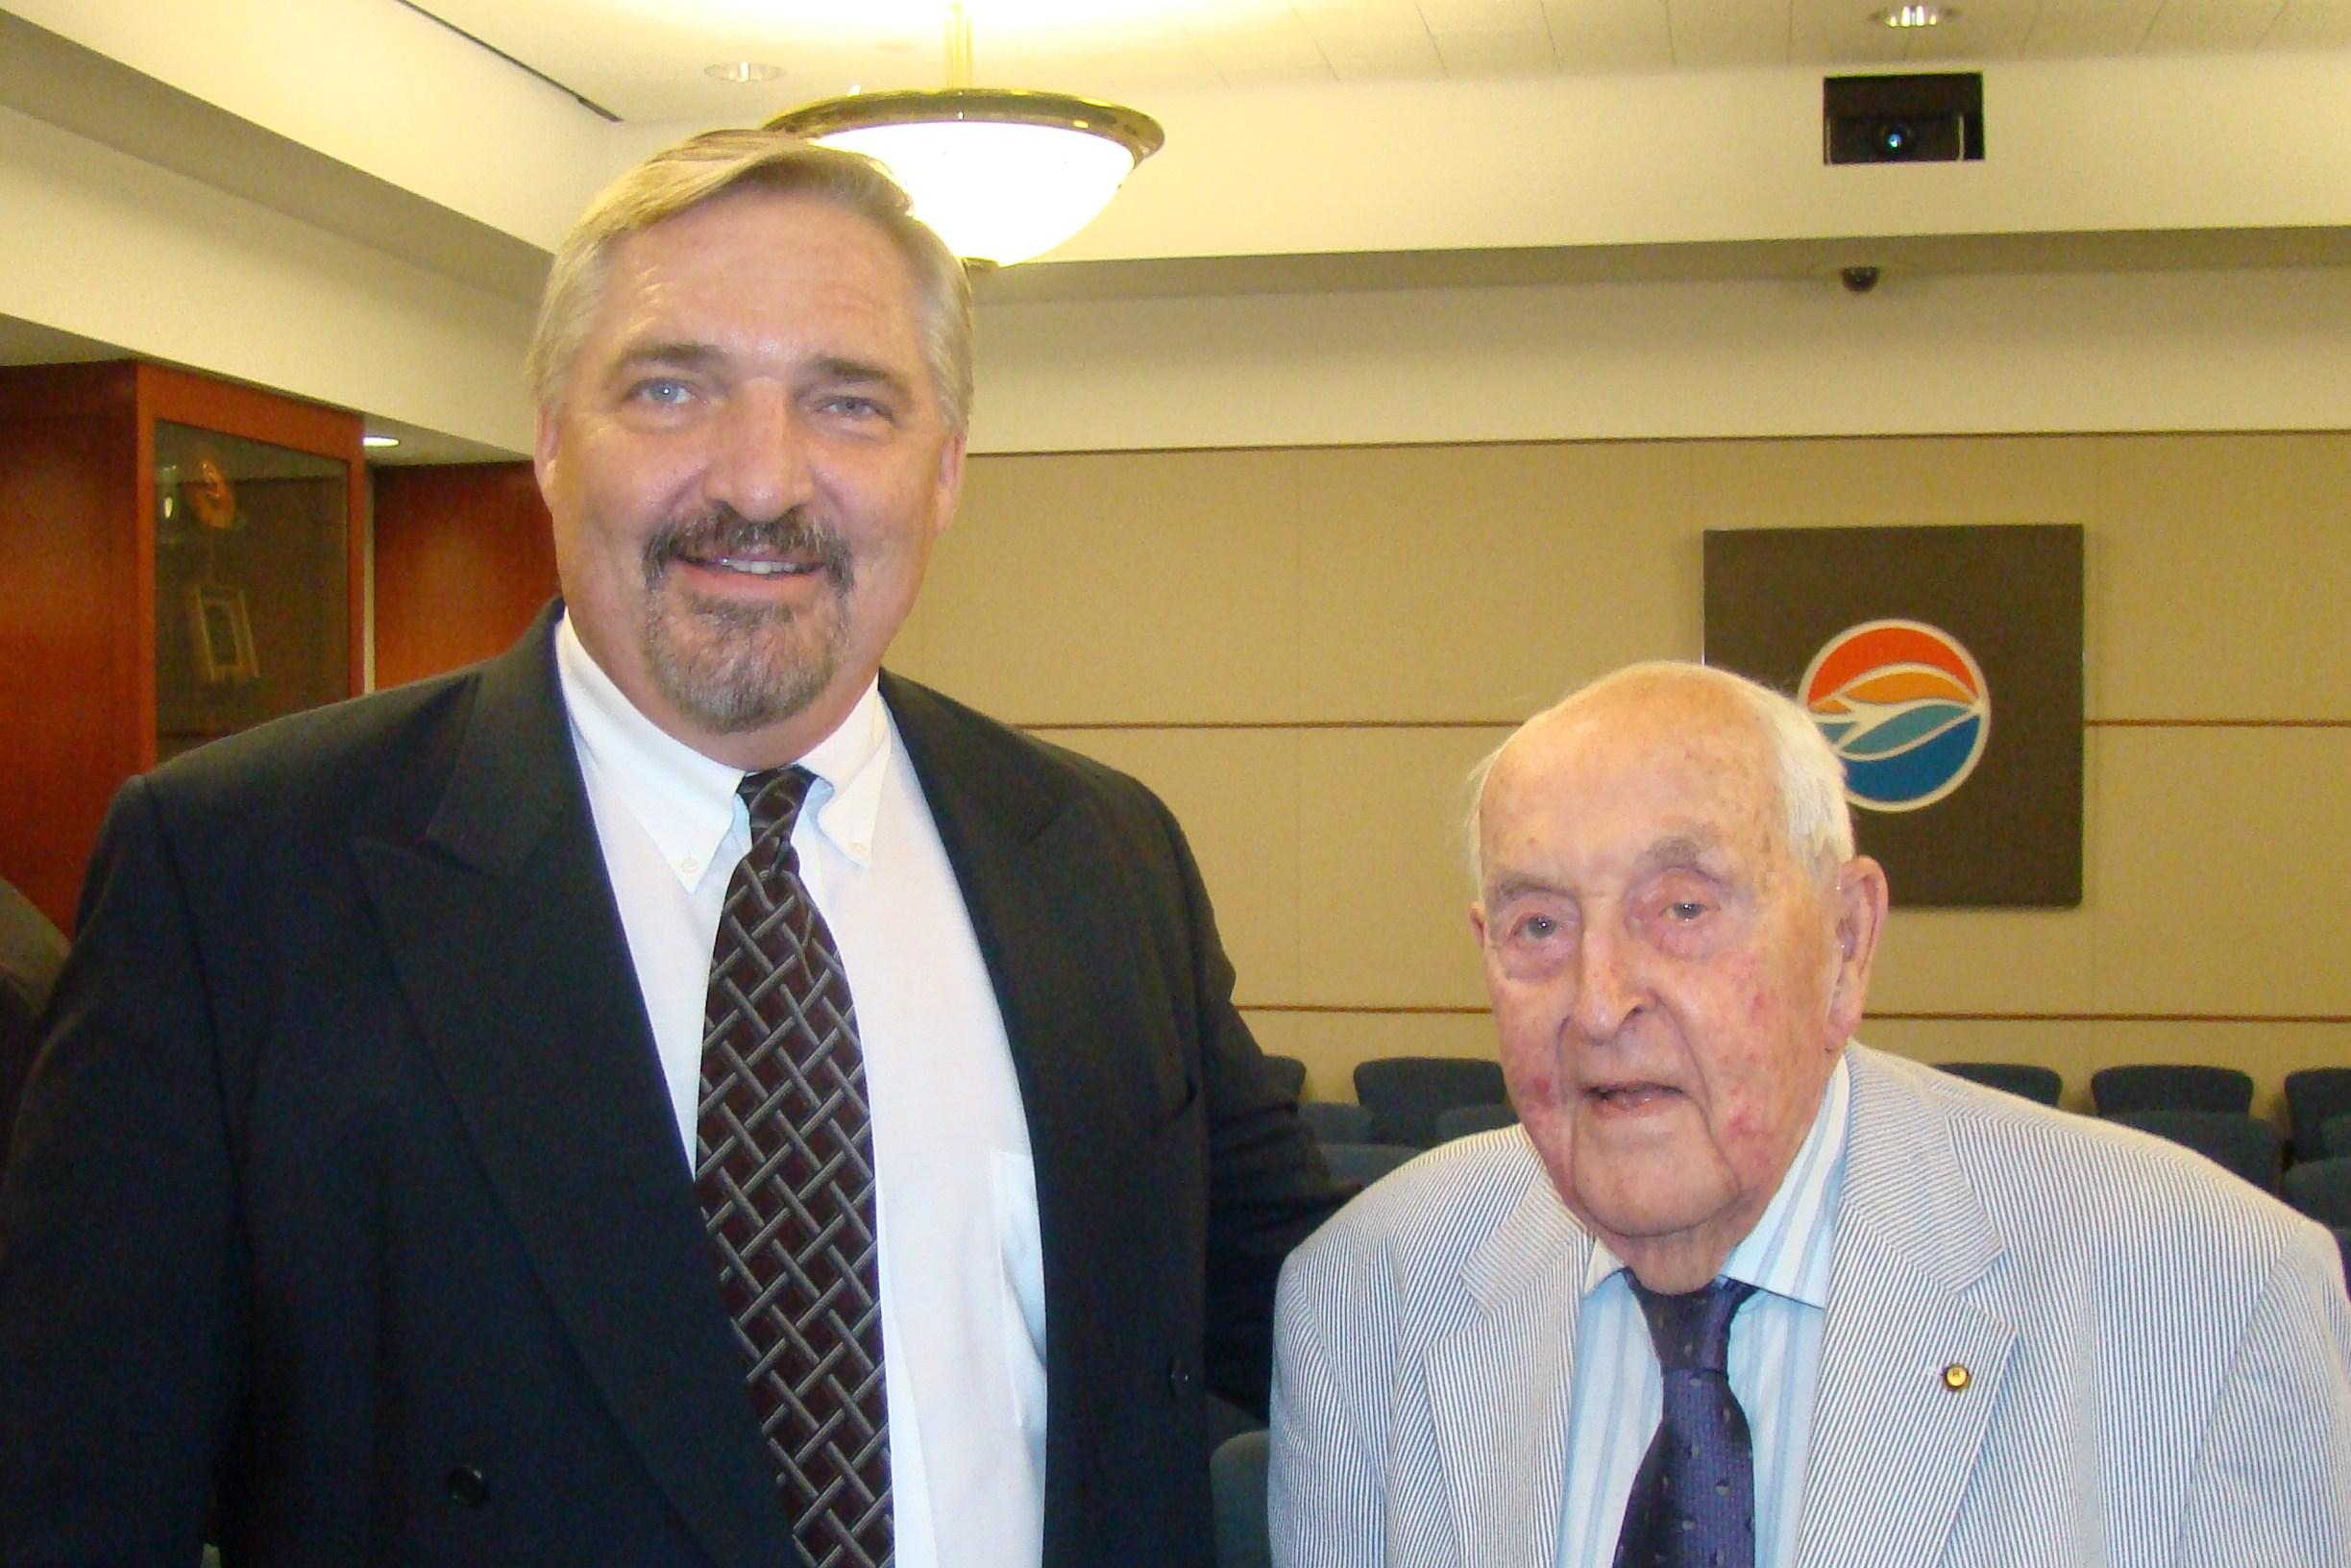 John Dahl & Sir Lenox, 27 Oct '11 - Copy (2).JPG